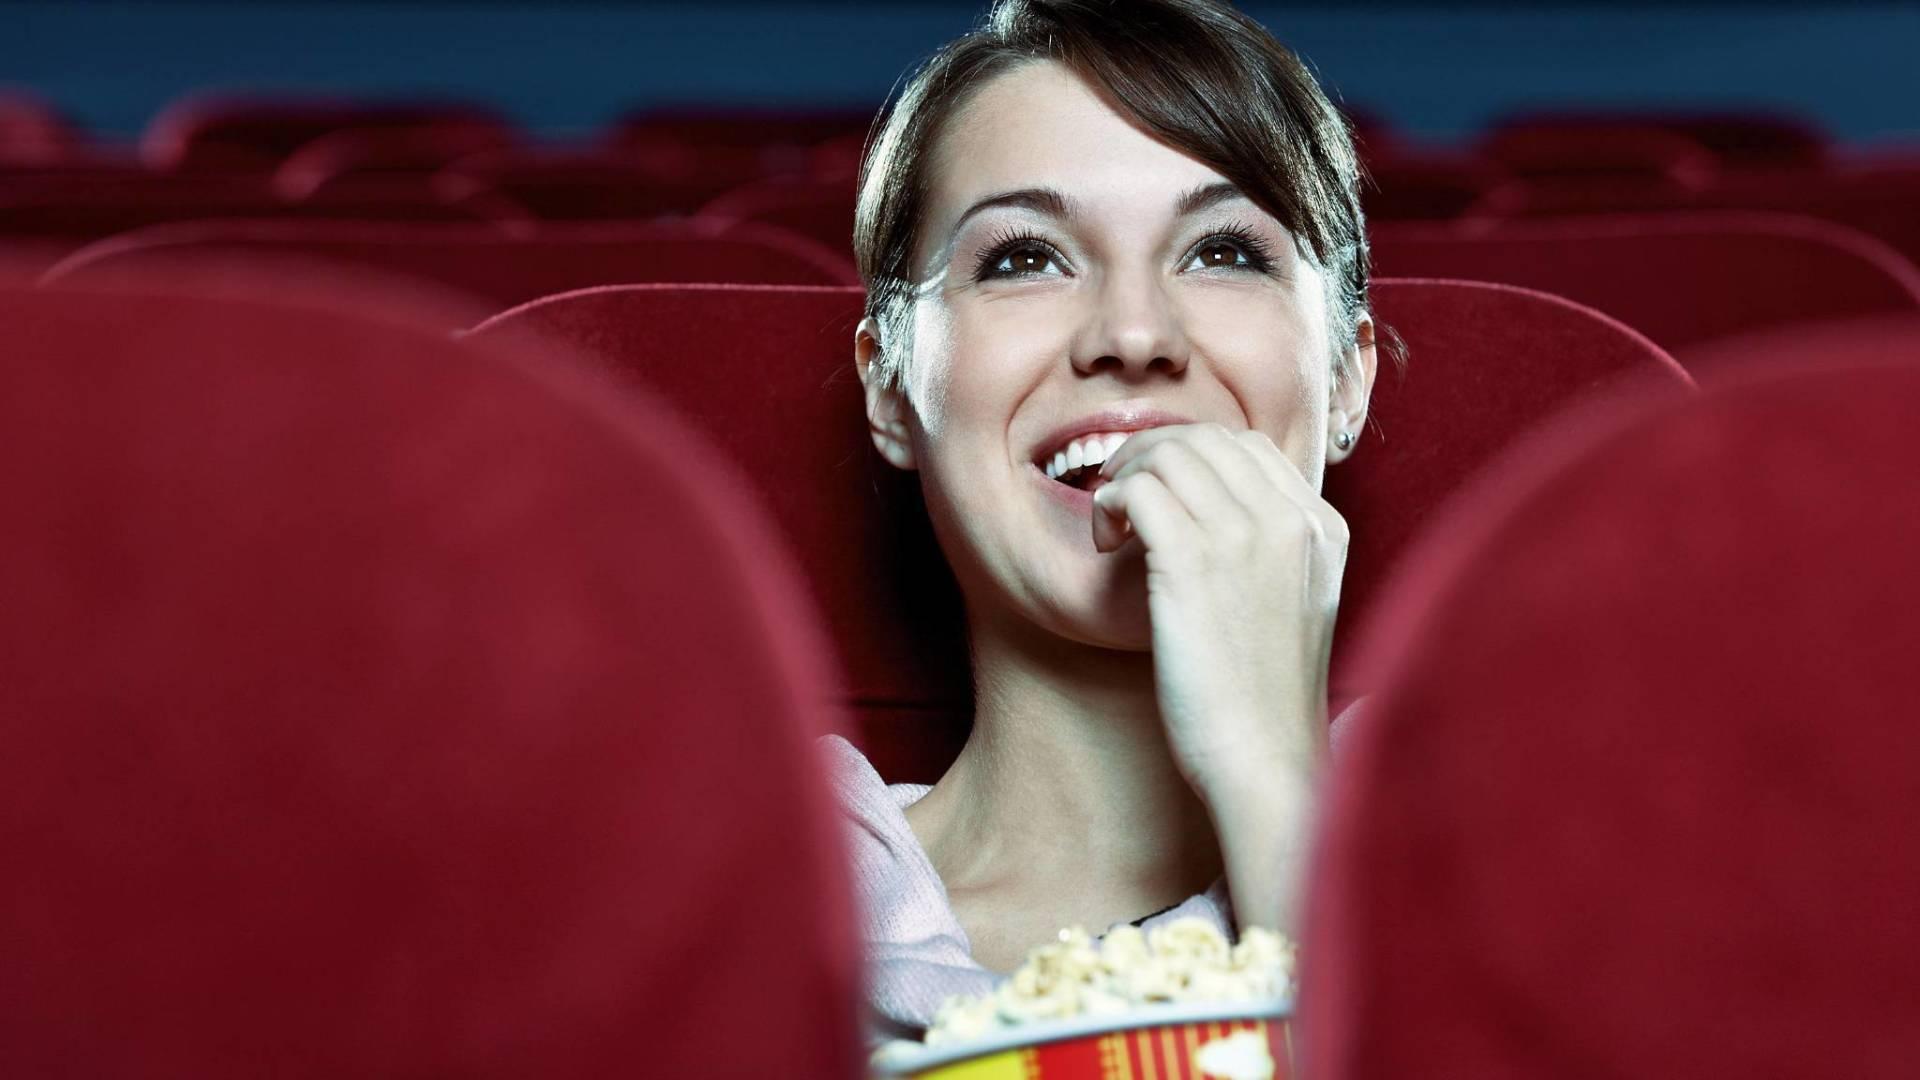 Generico Cinema